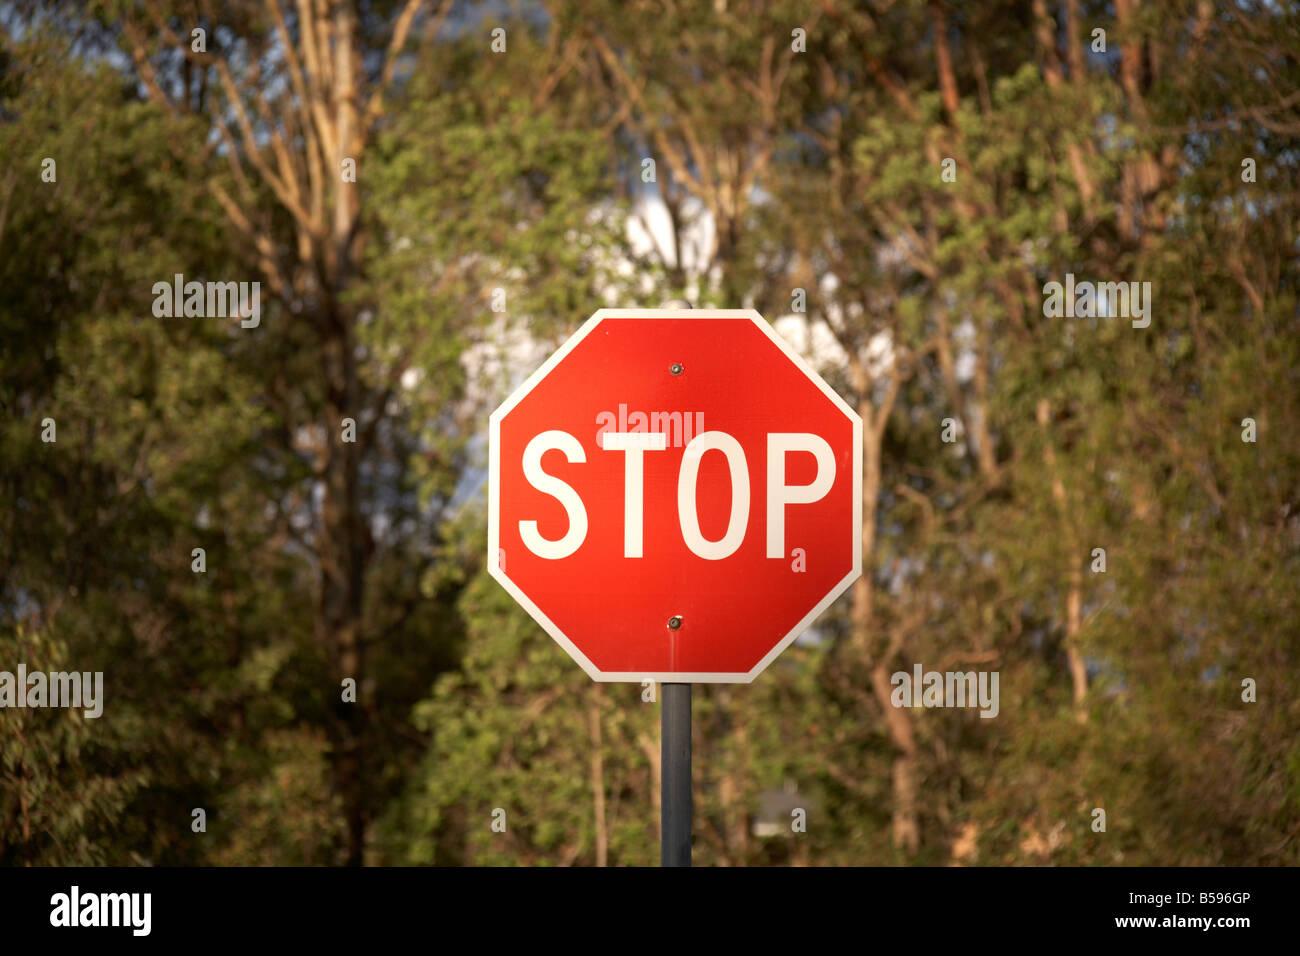 Stop sign in Queensland QLD Australia - Stock Image